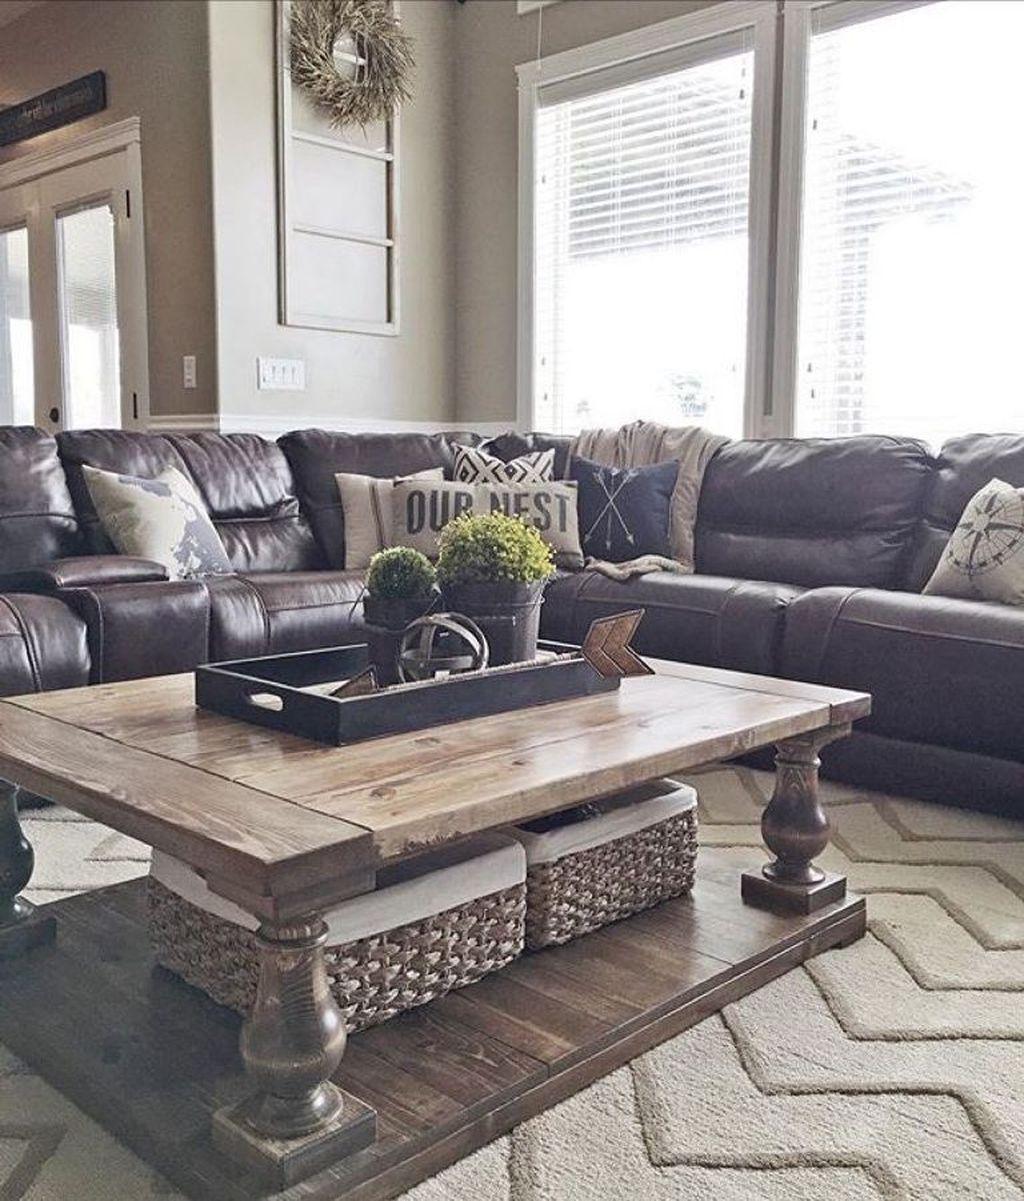 Excellent Furniture Design Ideas For Your Living Room 32